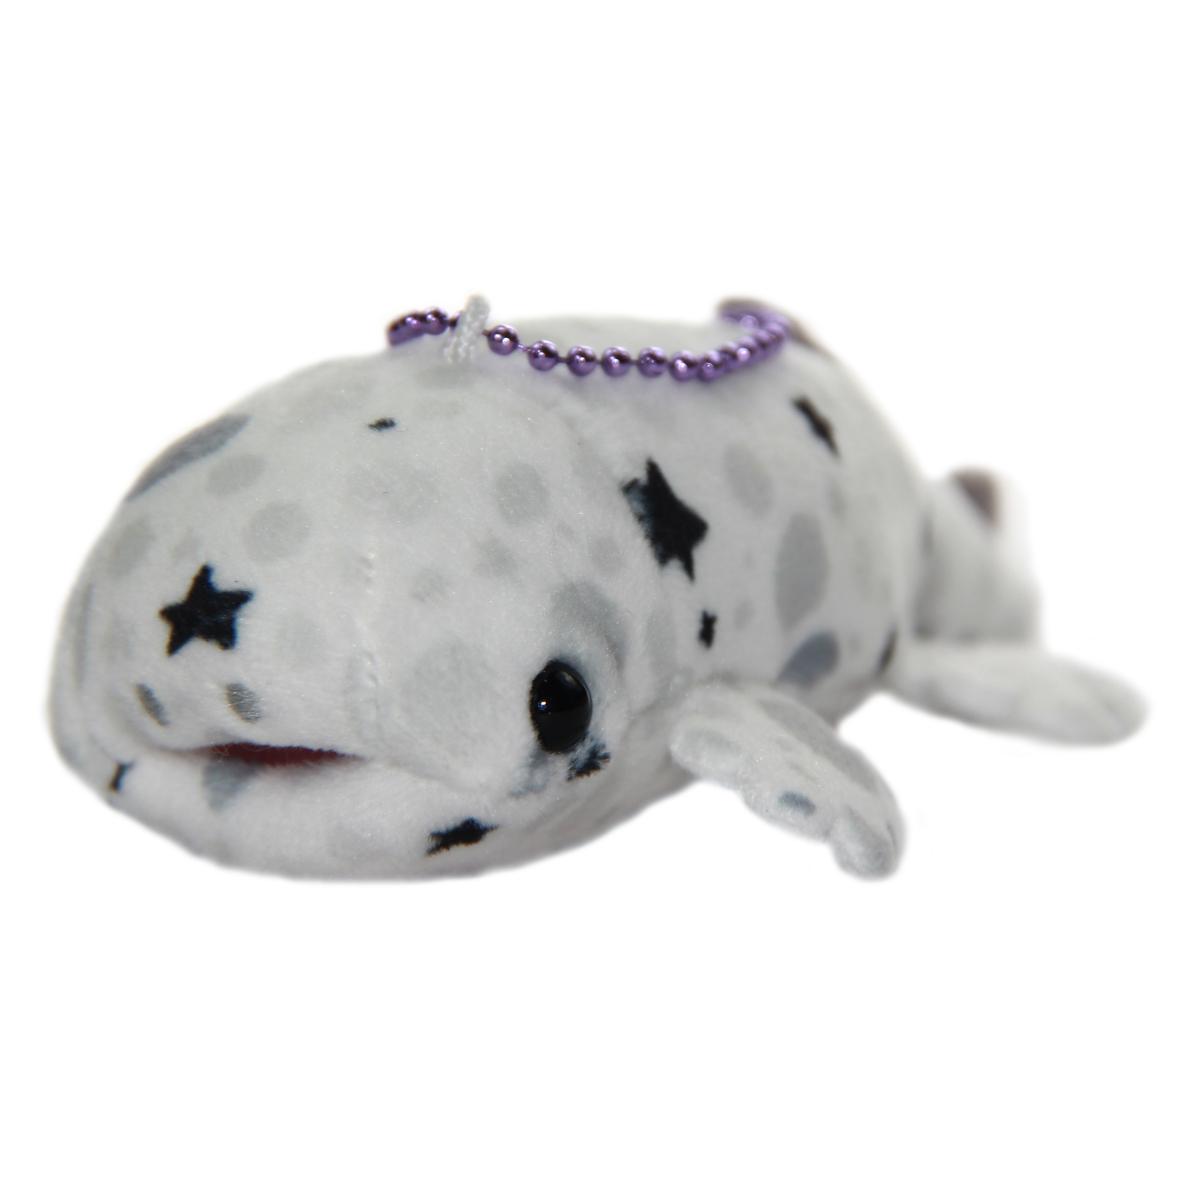 Mochi Puni Salamander Plush Doll, Keychain Size, White 4 Inches